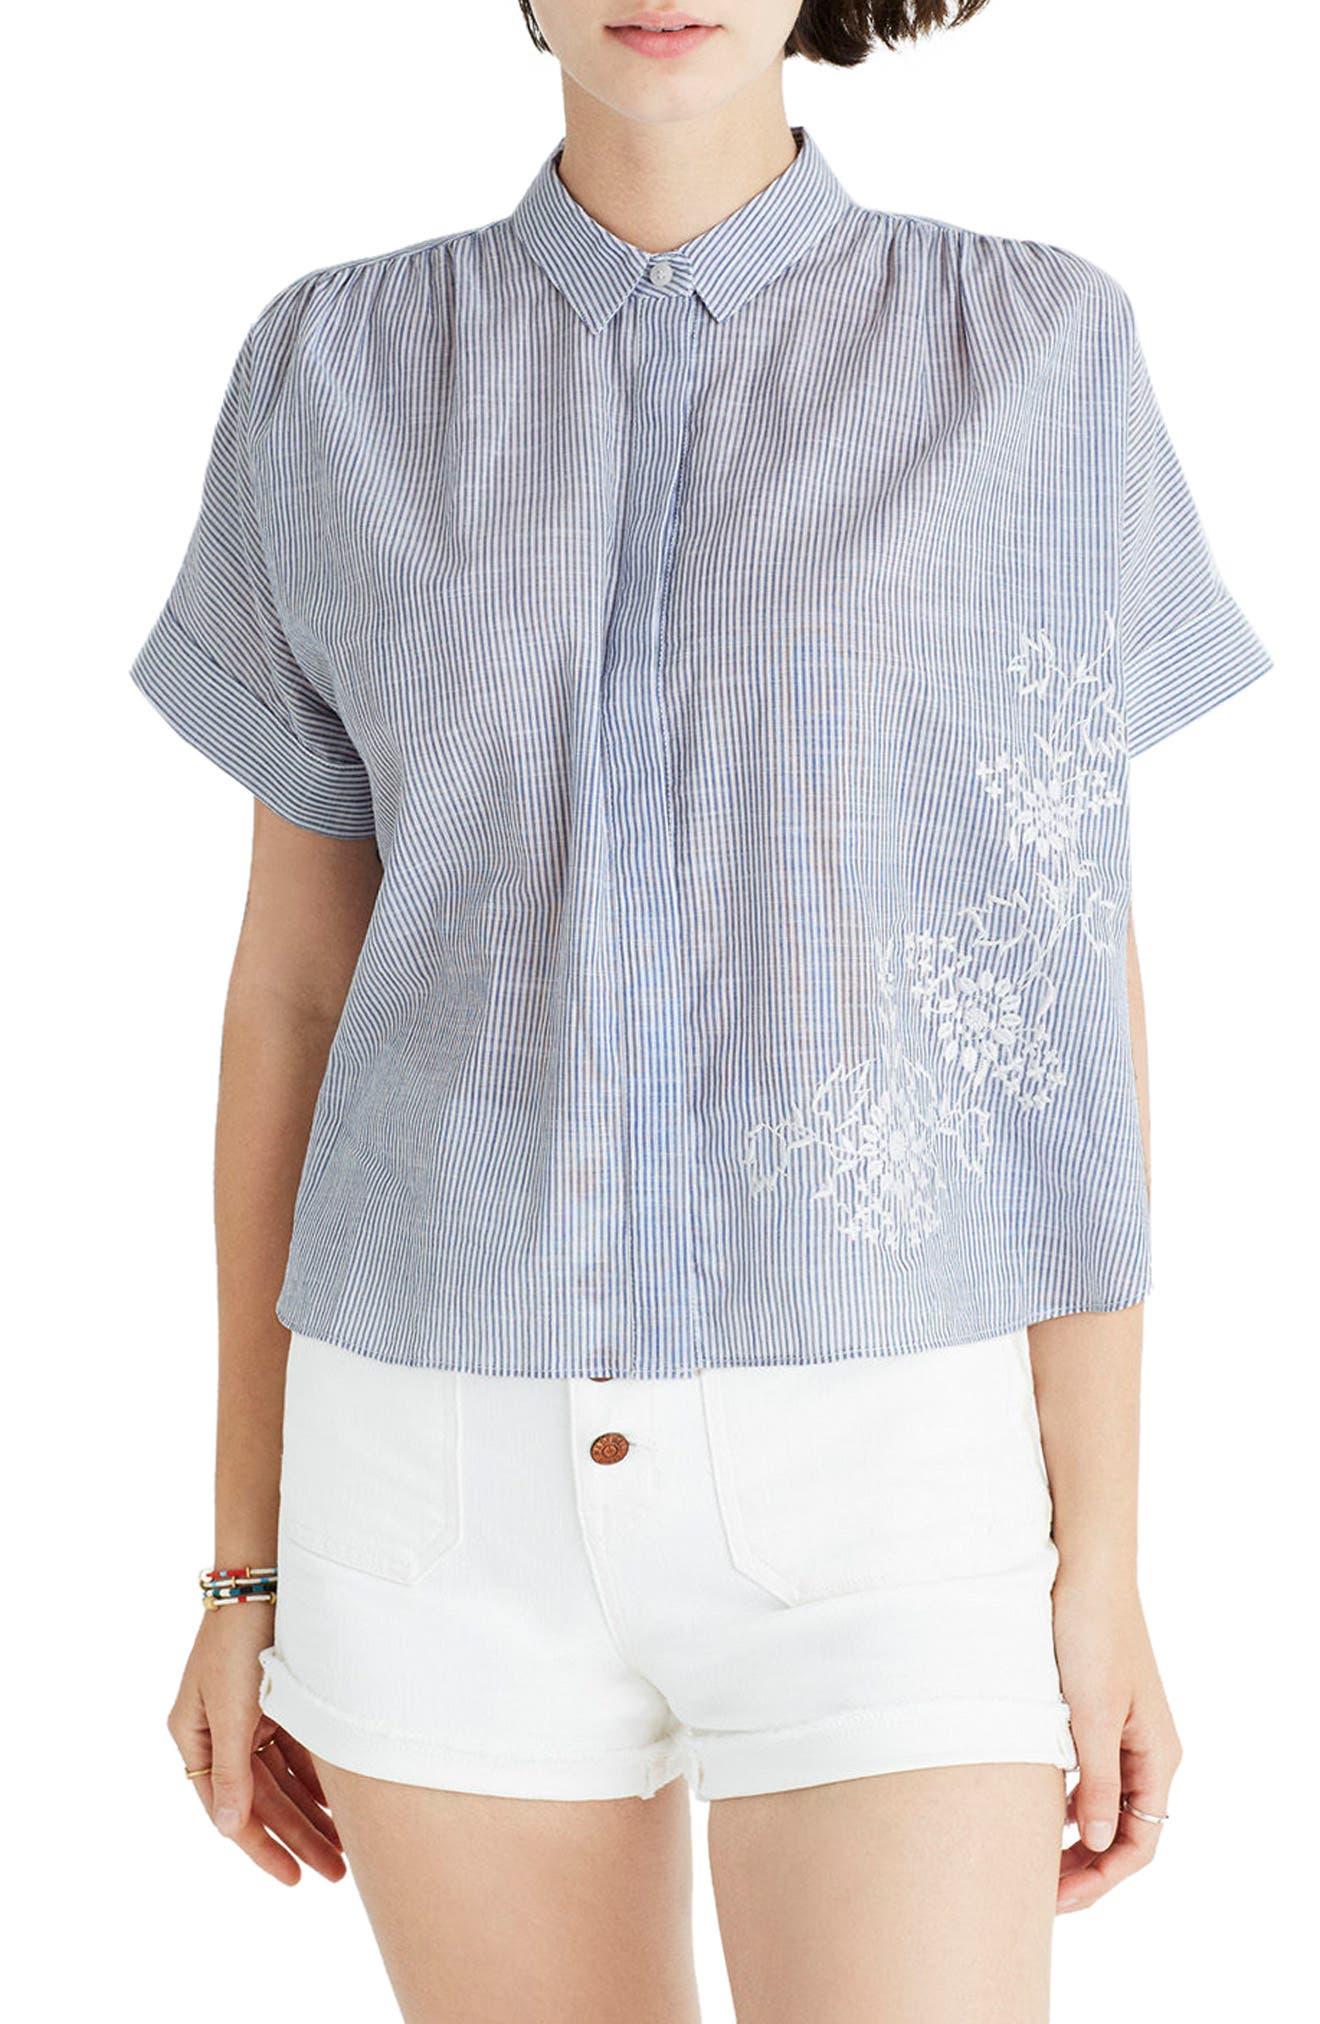 MADEWELL Embroidered Hilltop Shirt